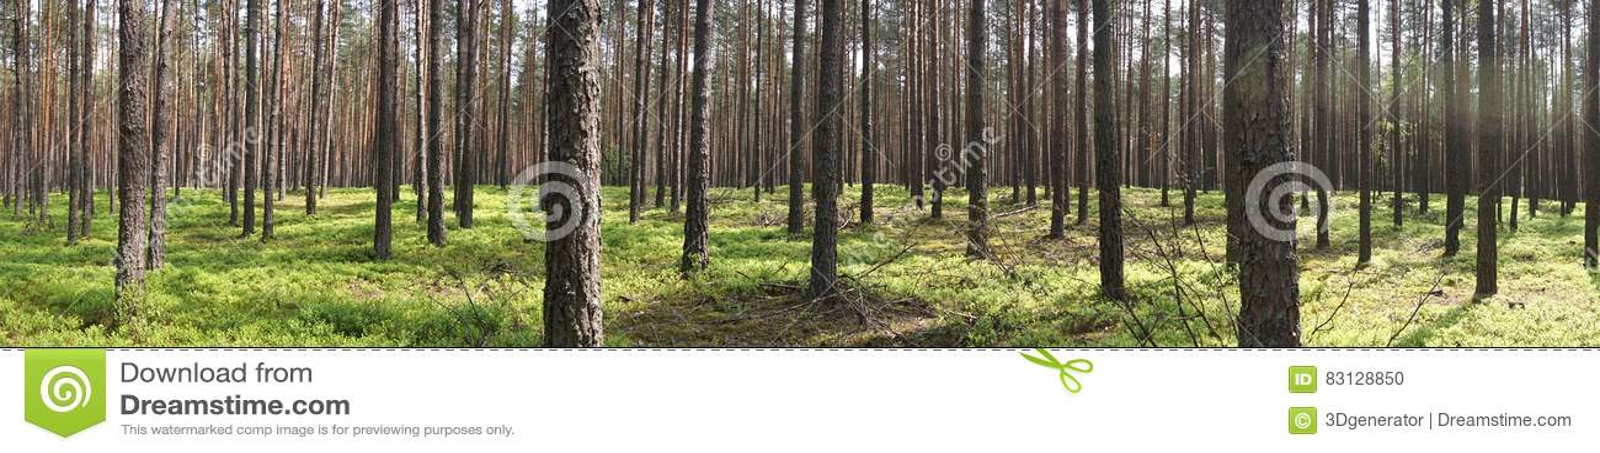 Árboles en bosque